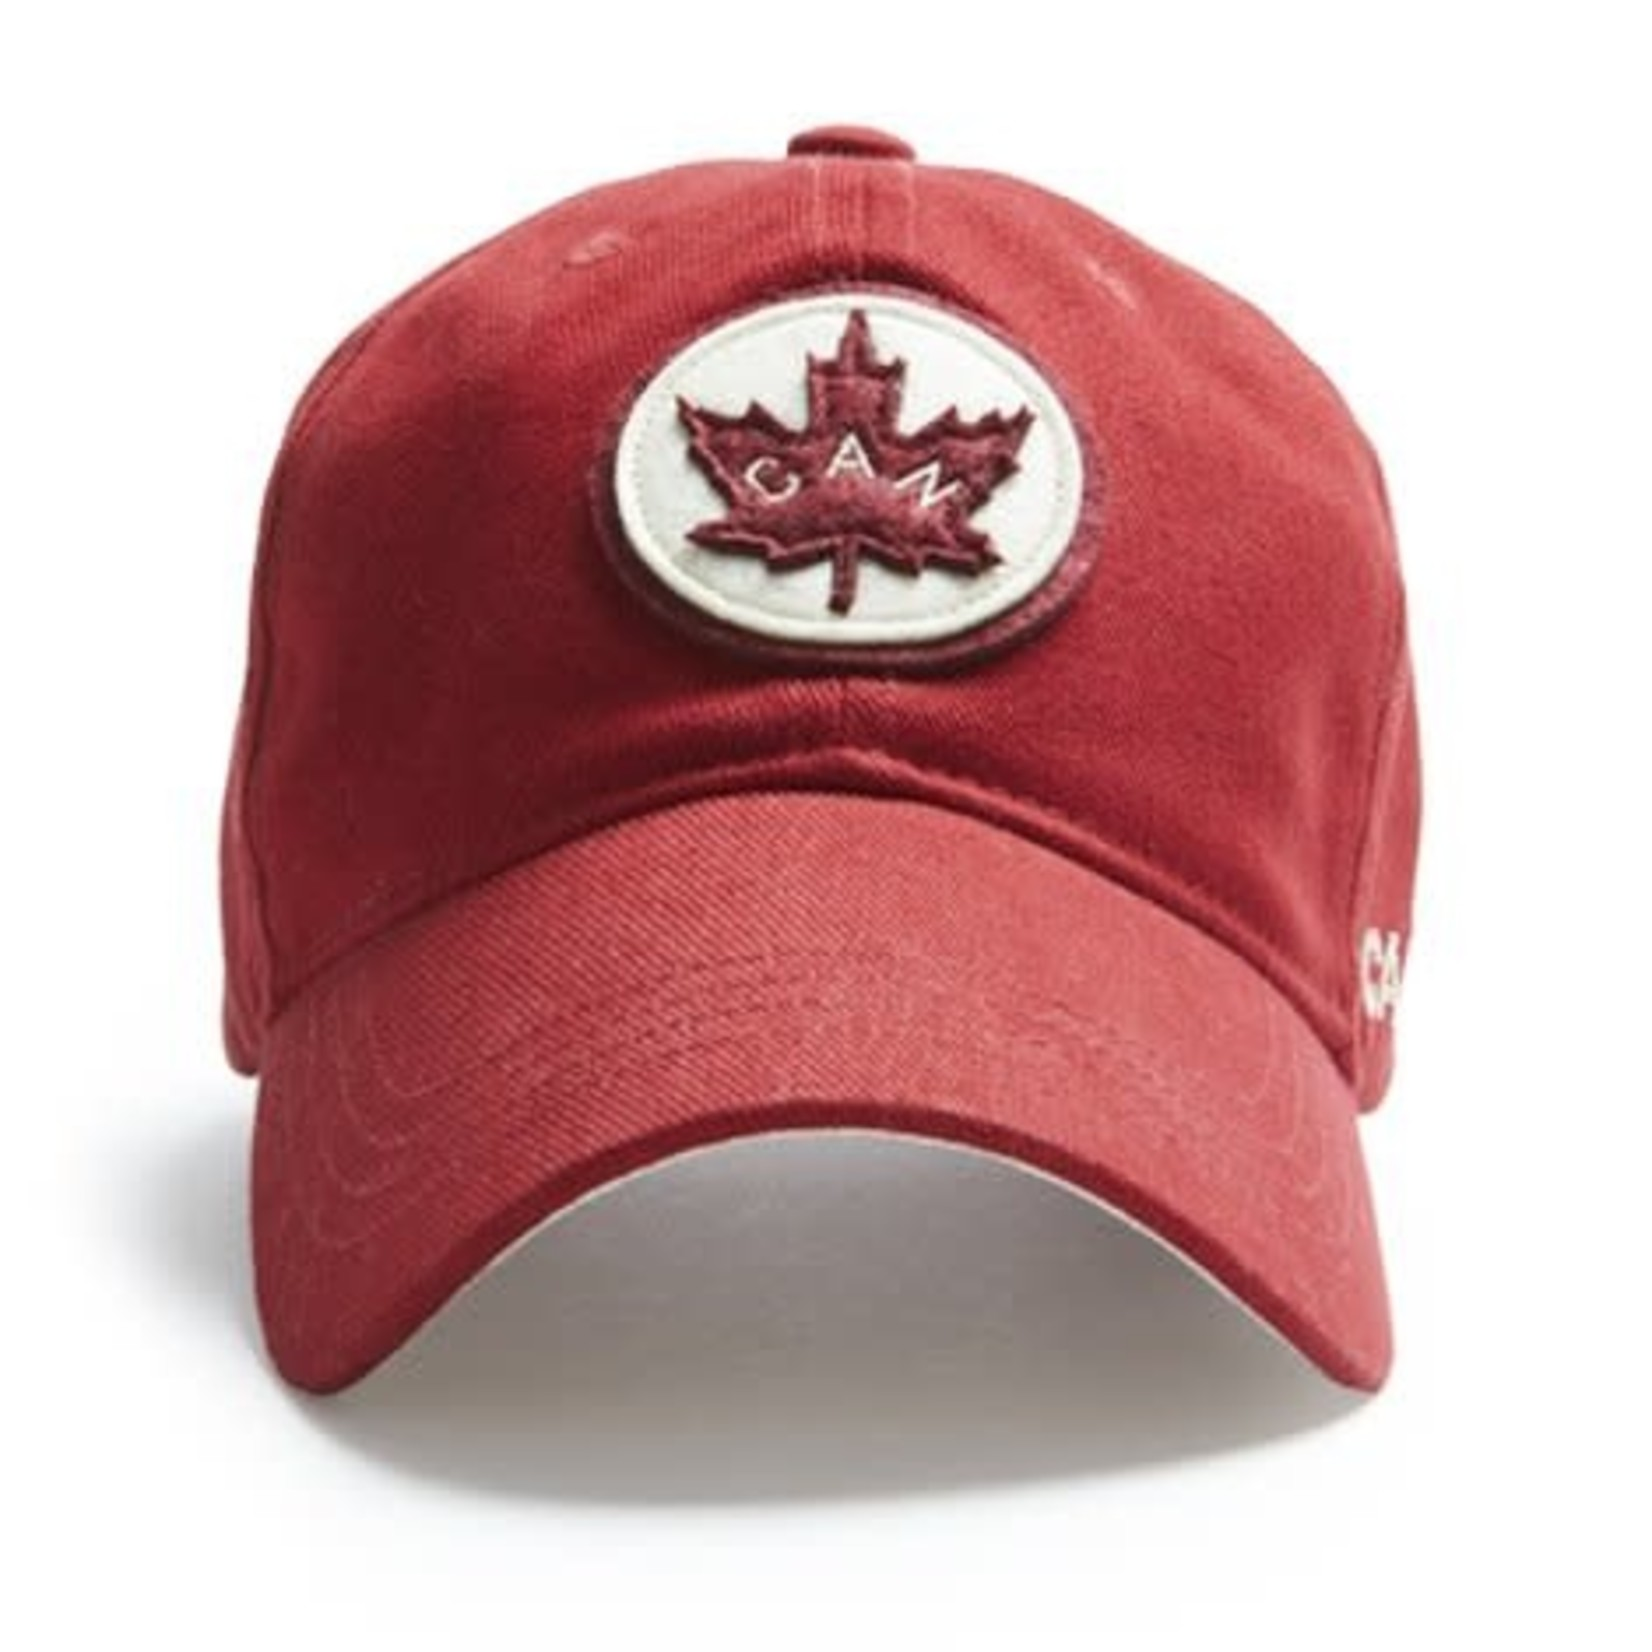 Red Canoe Red Canoe Canada Maple Leaf Cap